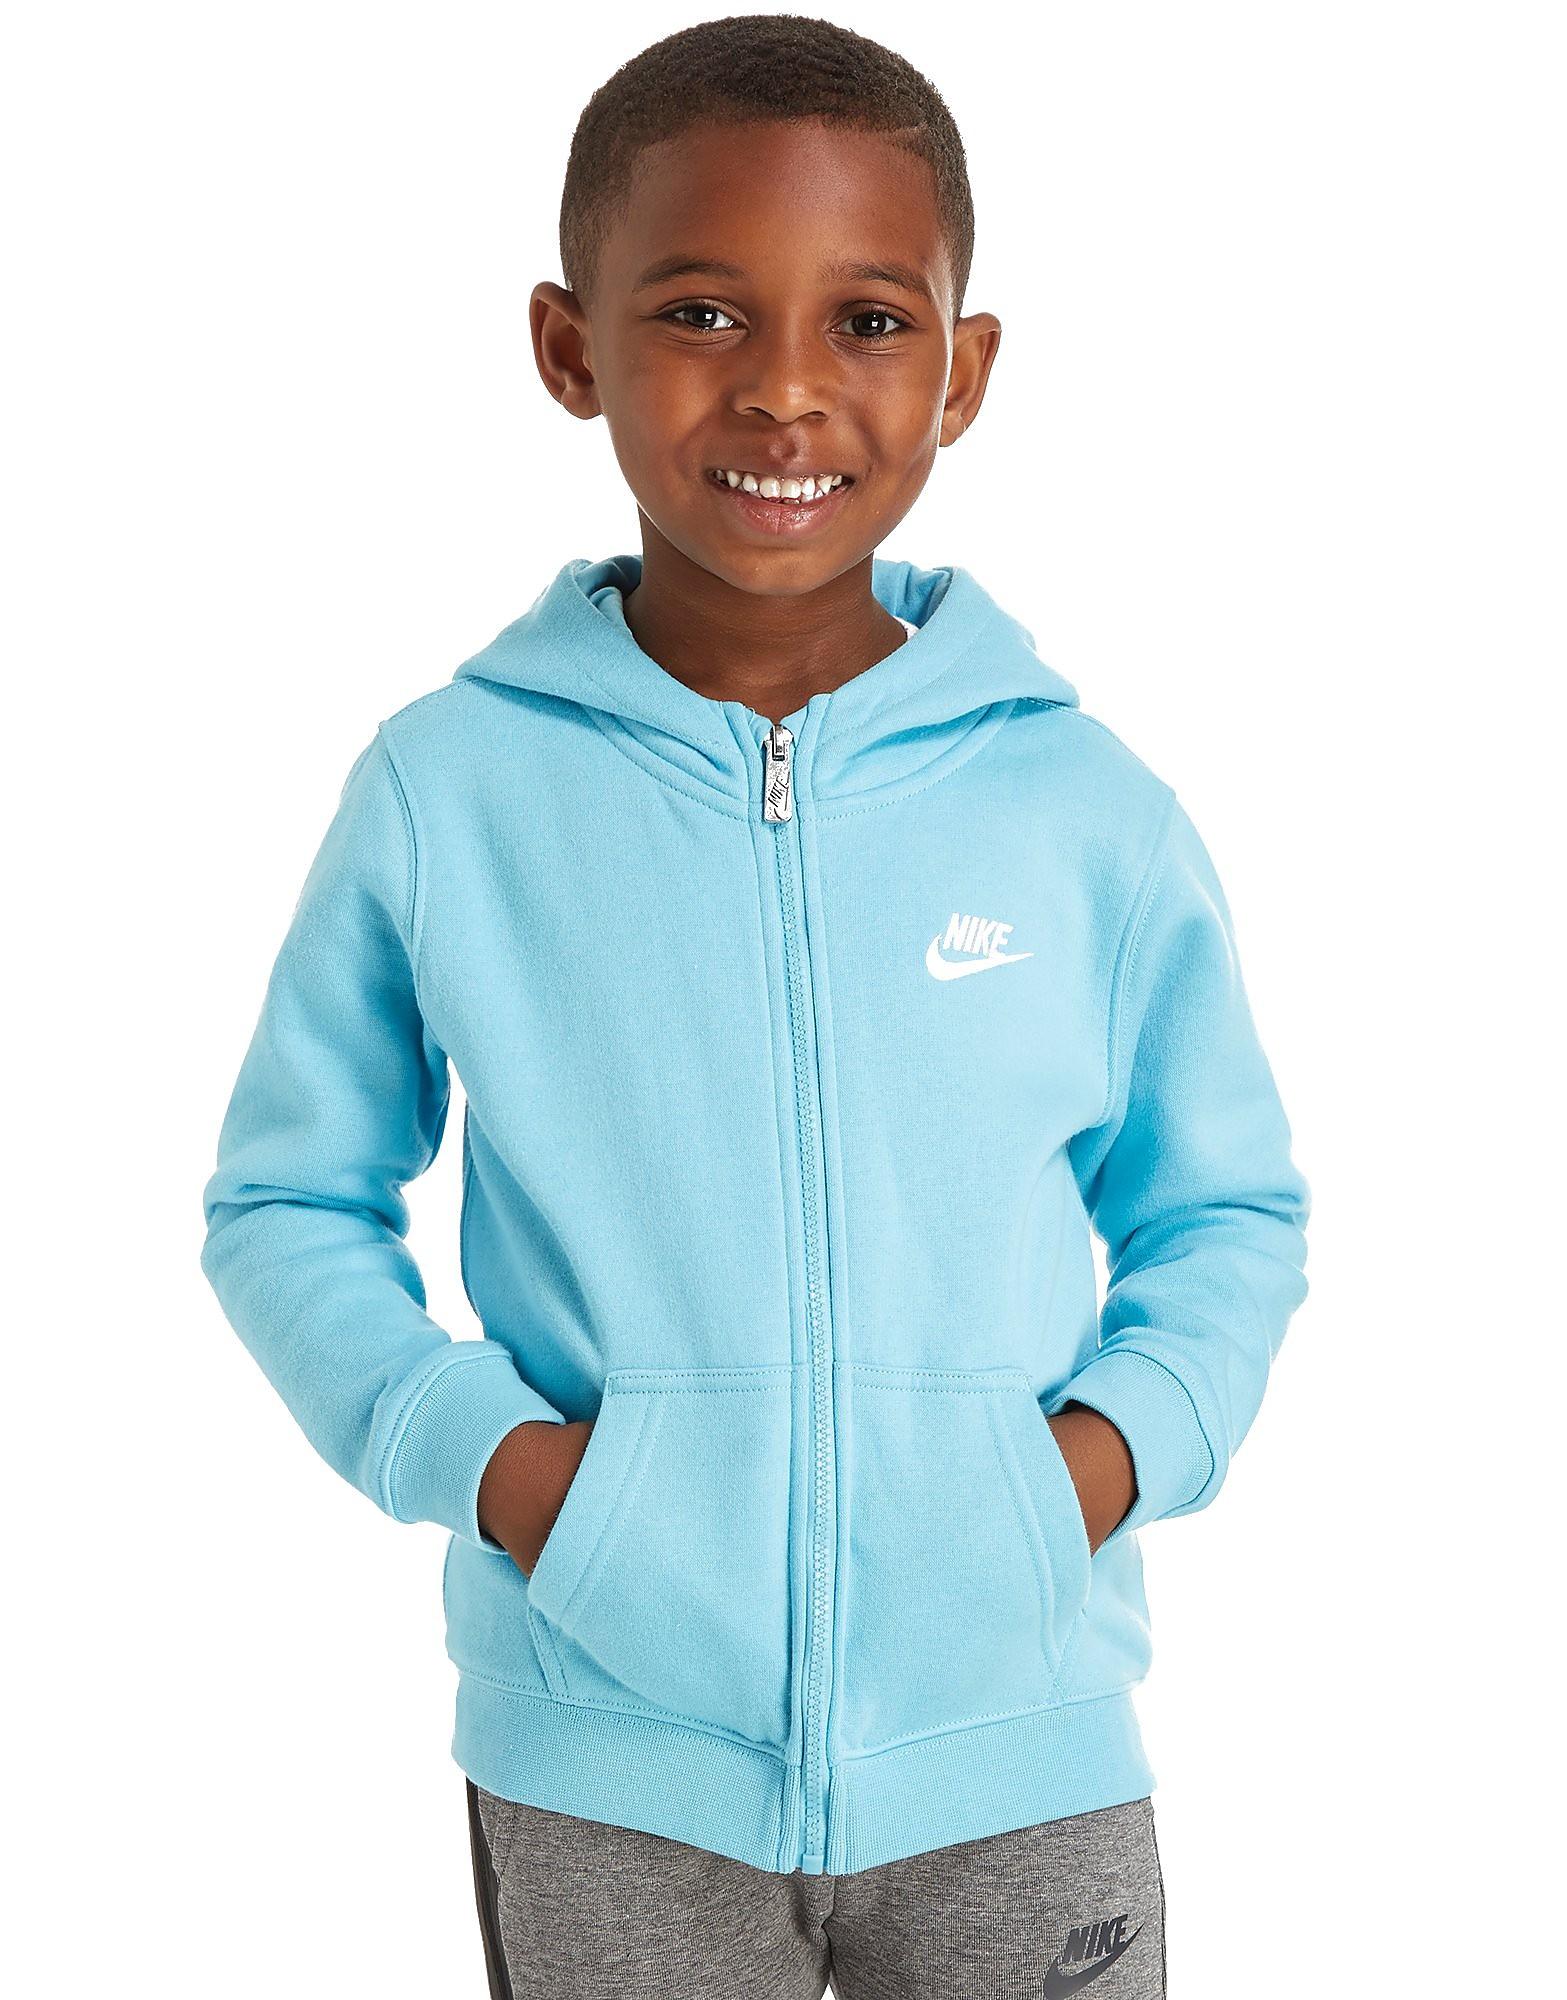 Nike chaqueta con capucha infantil